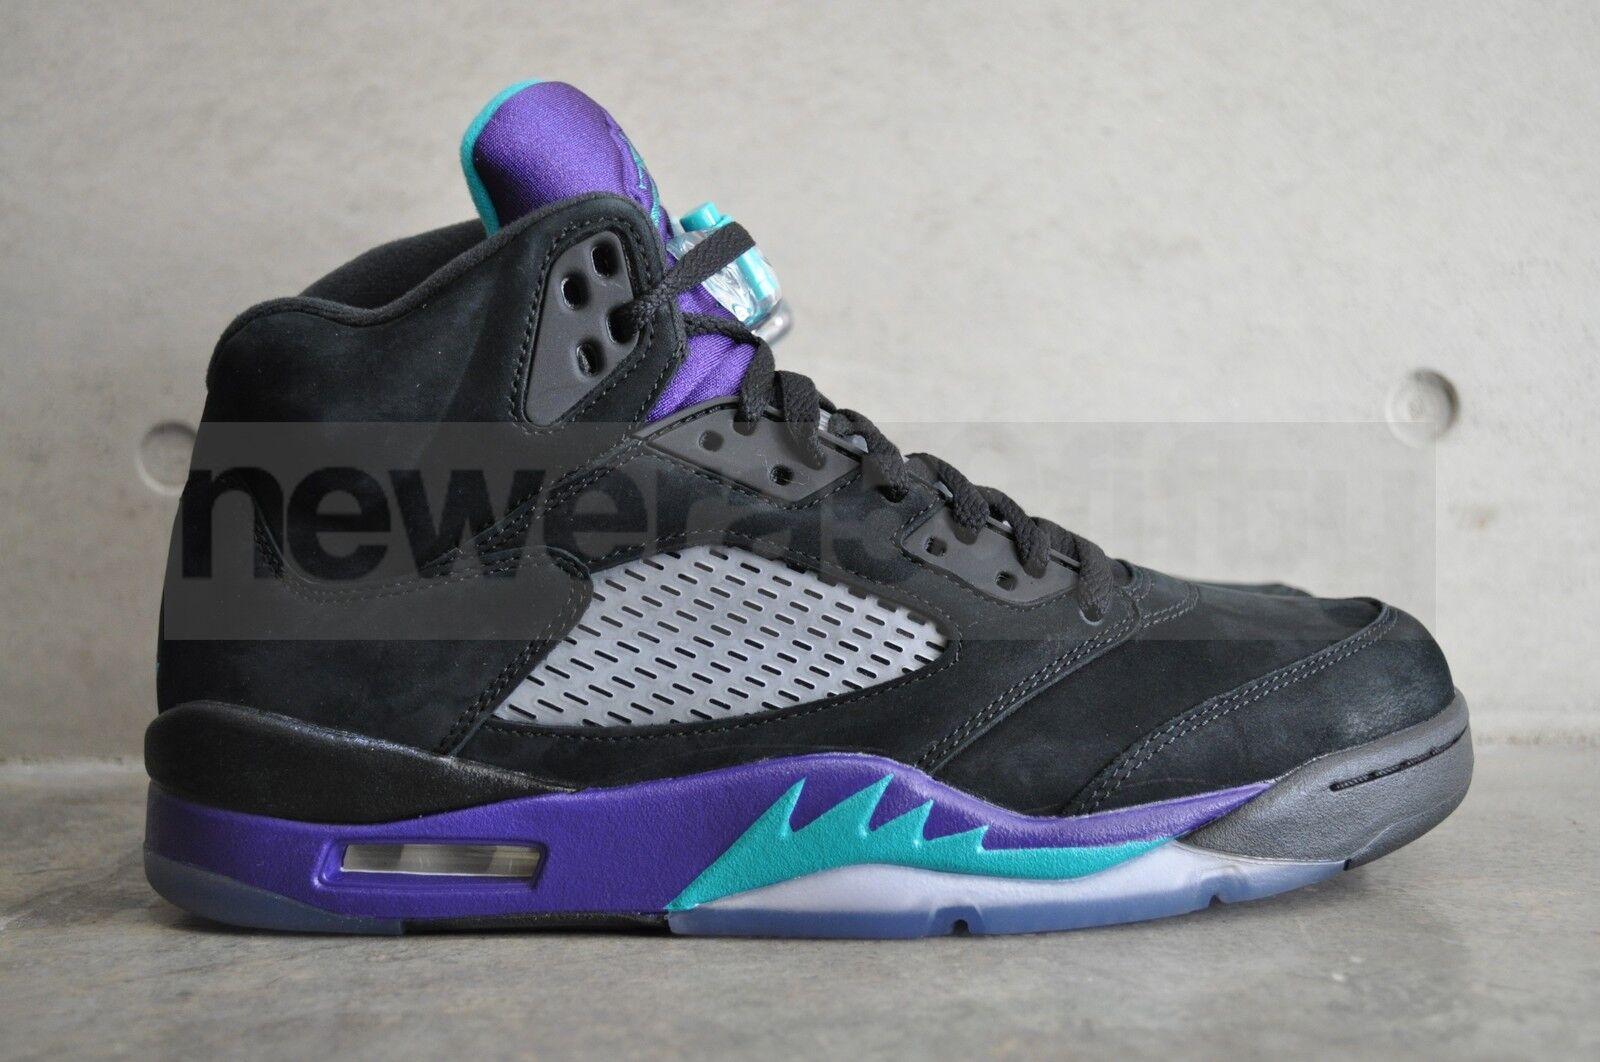 Nike Jordan 5 Retro  Negro Air Air Air uva  - Negro Nuevo Esmeralda Uva De Hielo d9c157